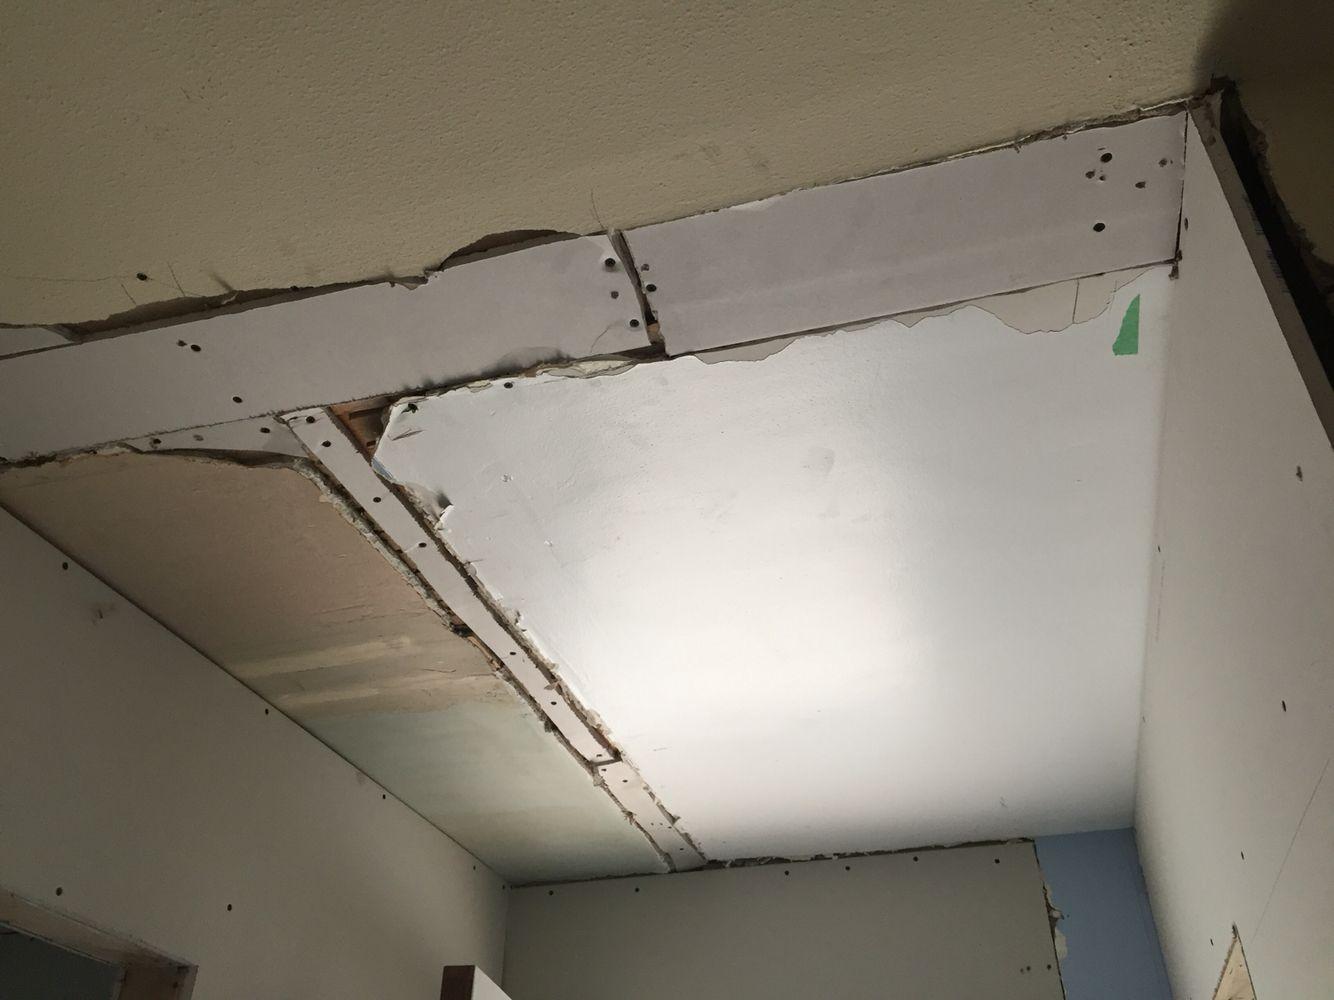 Upstairs hallway ceiling #sheetrock 9/22 77g